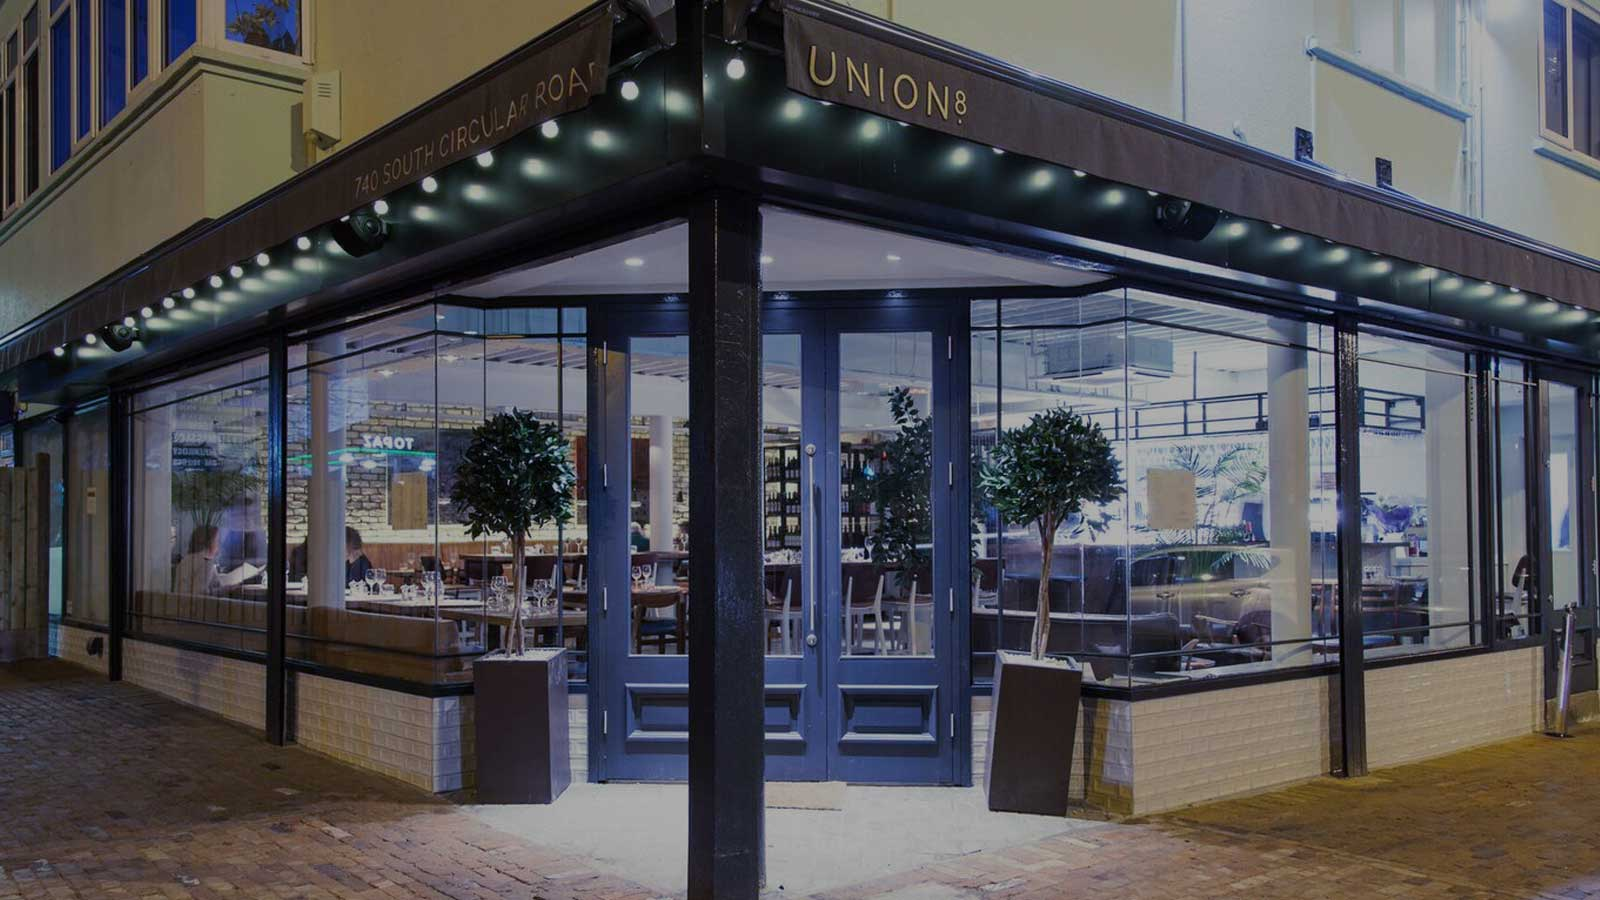 Union 8 Restaurant